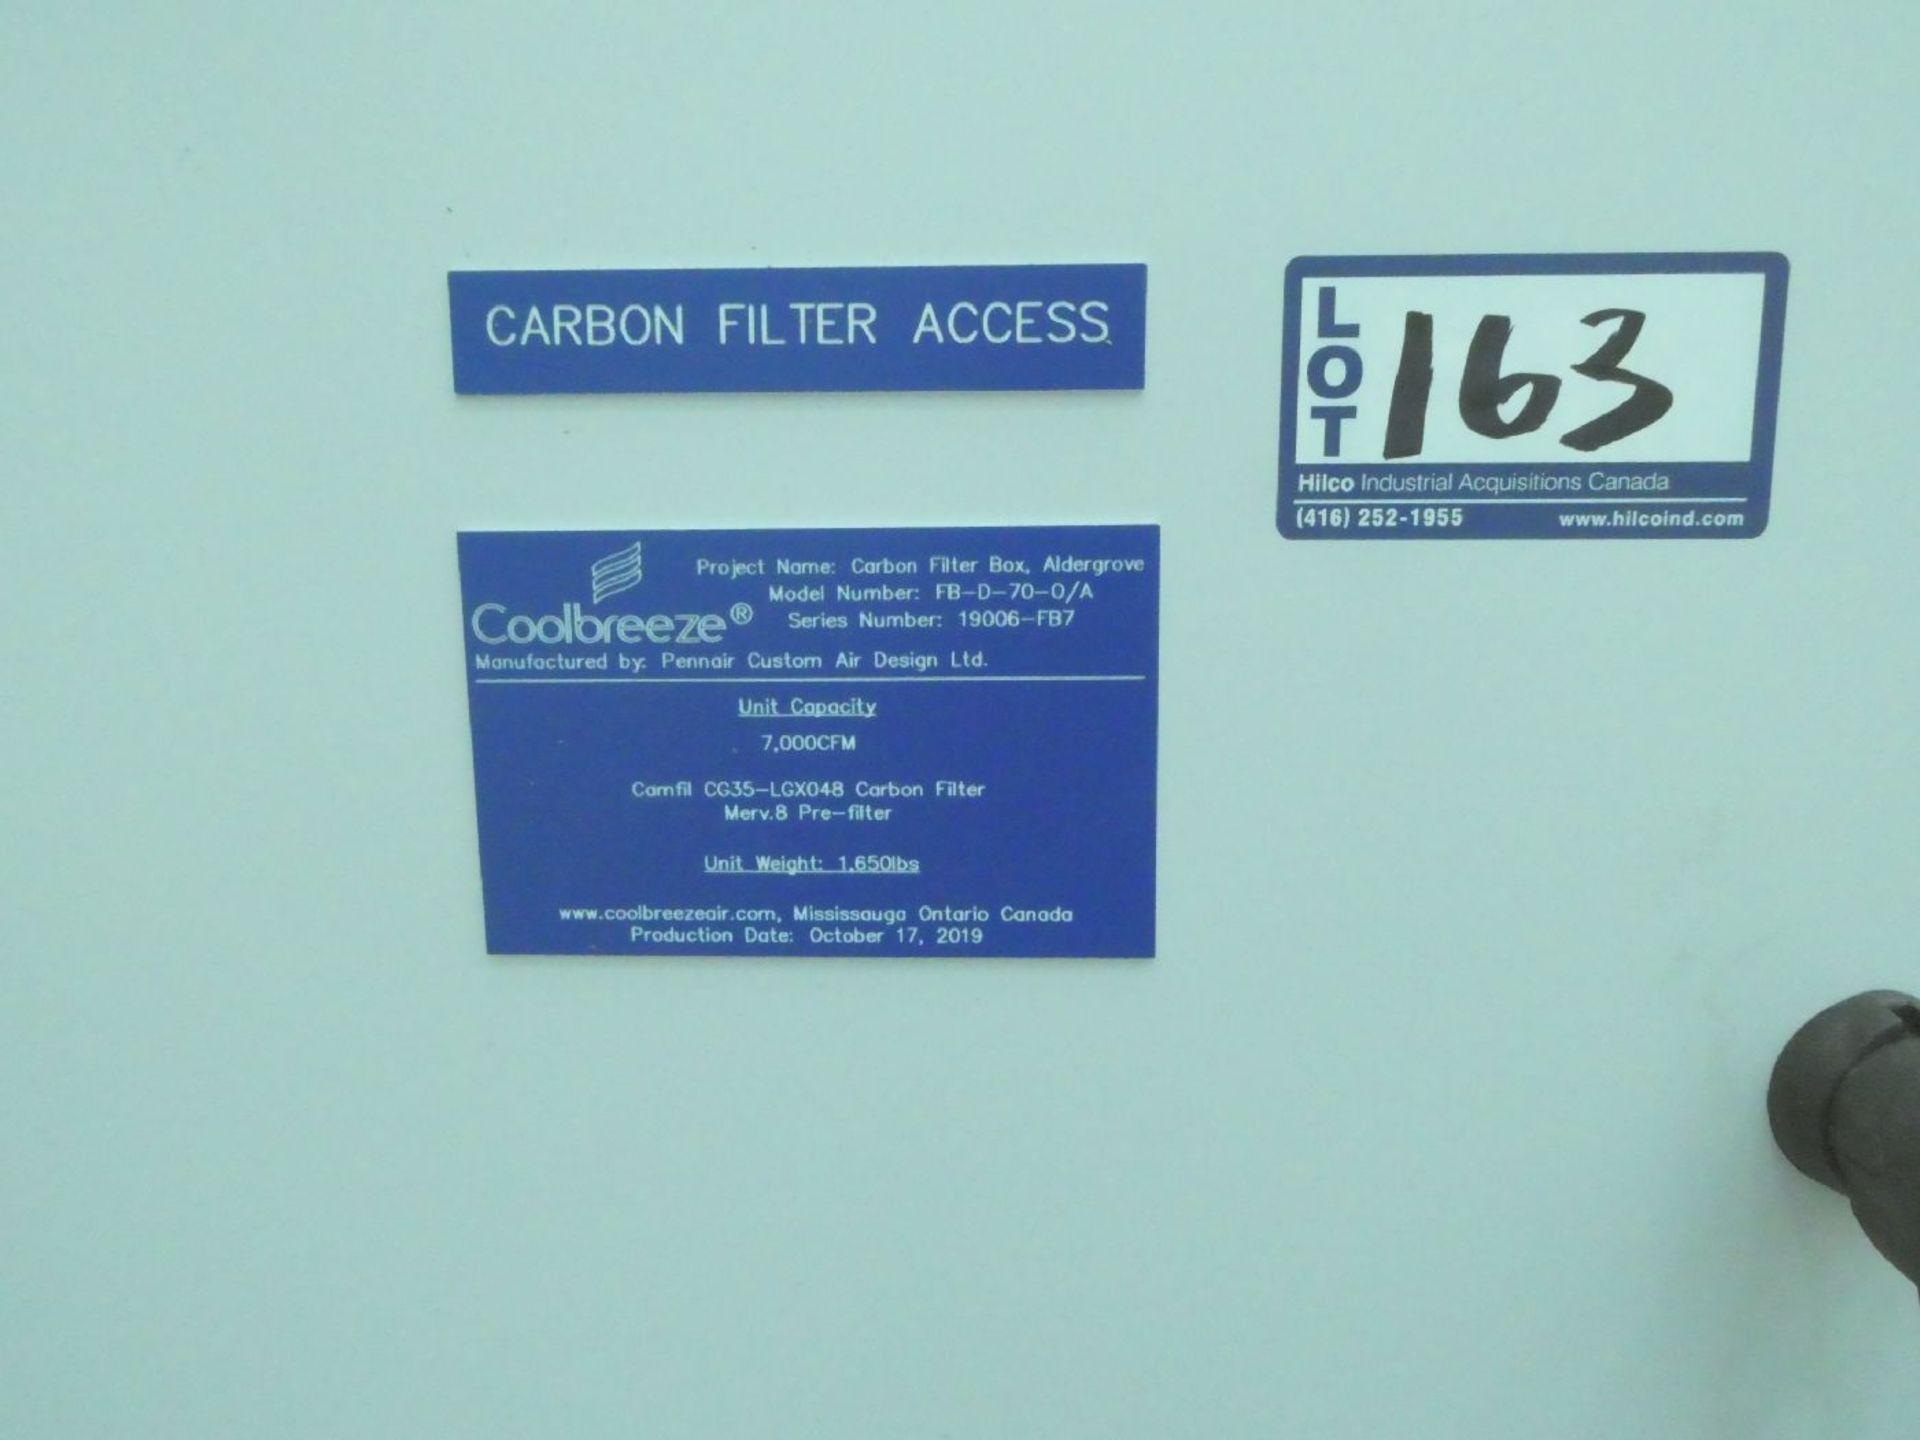 Pennair FB-D-70-O/A Coolbreeze 7,000CFM Carbon Filter Box - Image 2 of 2